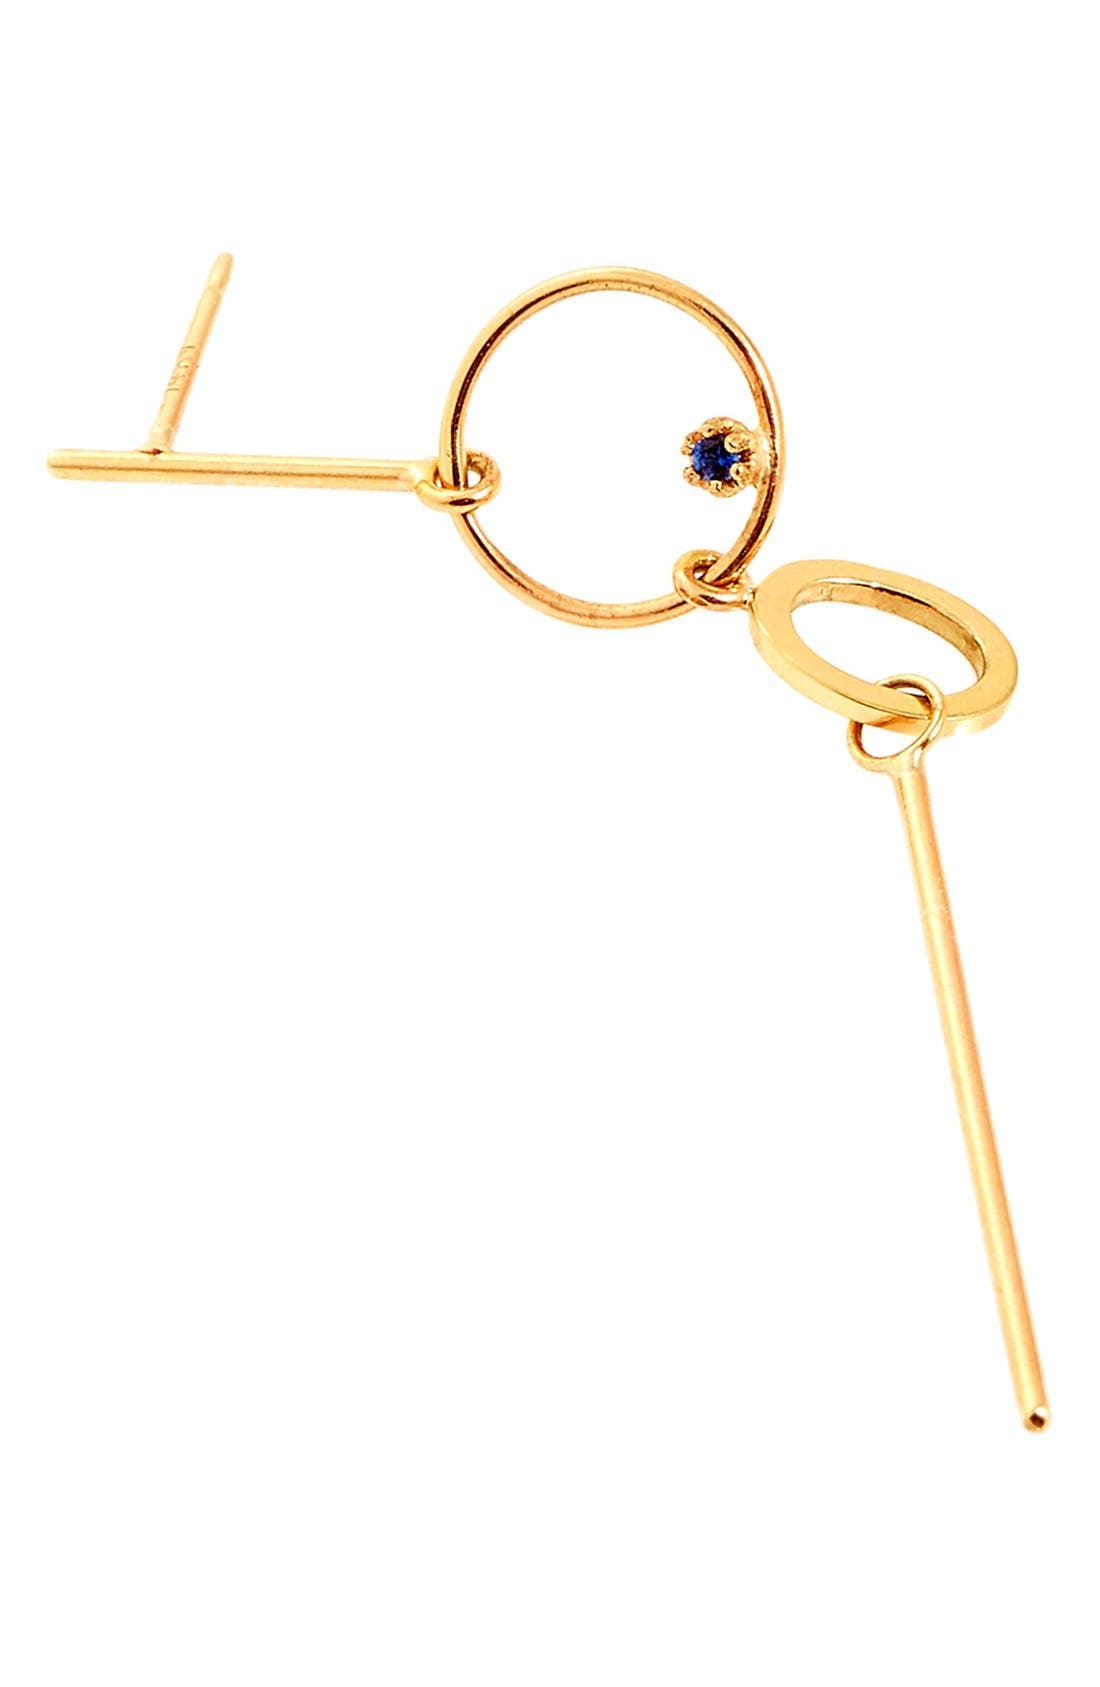 SARAH & SEBASTIAN 'Long Bubble' Gold & Sapphire Statement Earring